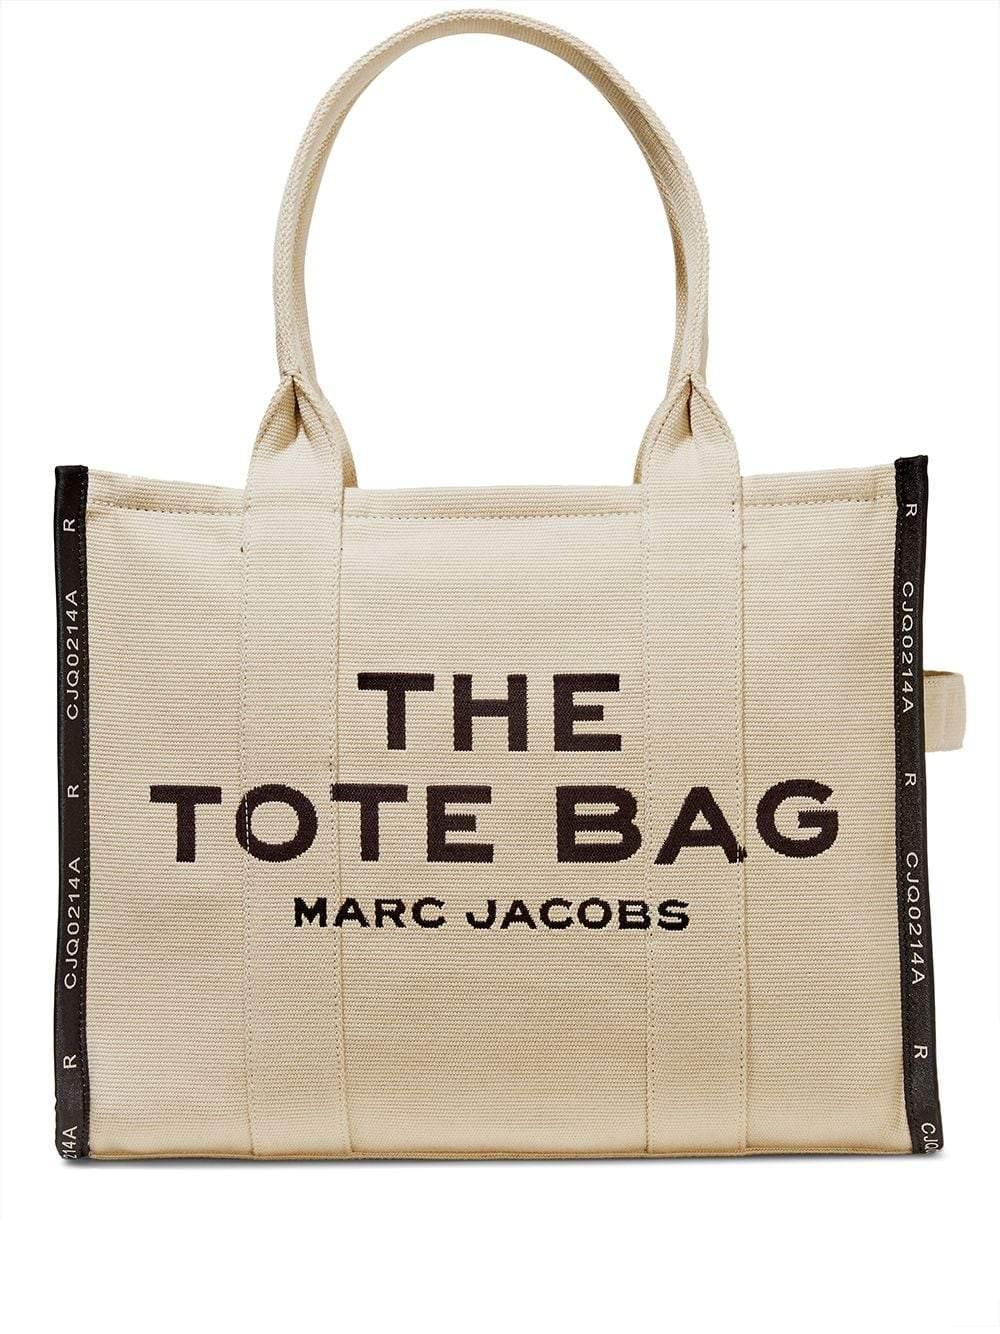 Beige/black cotton-blend The Jacquard Traveler tote bag from Marc Jacobs featuring jacquard logo mot